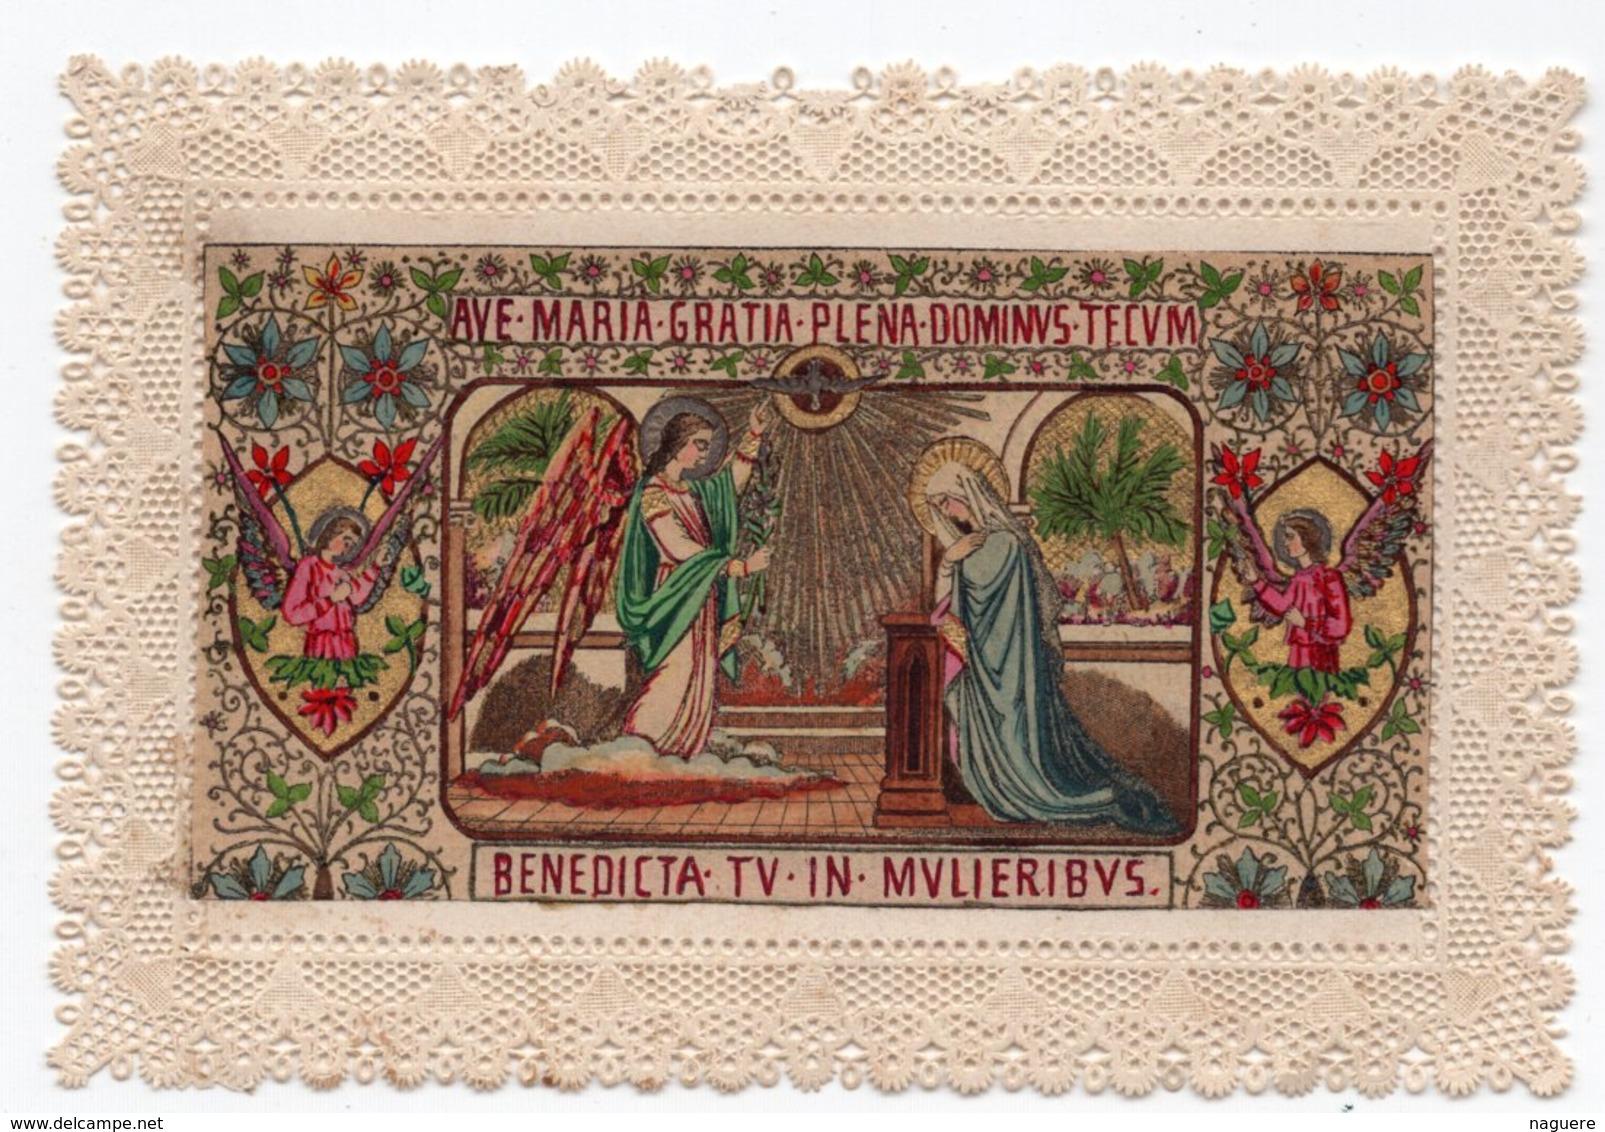 AVE MARIA  BENEDICTA TV IN MULIERIBUS  LITHOGRAPHIE COULEUR  CANIVET XIXéme - Images Religieuses